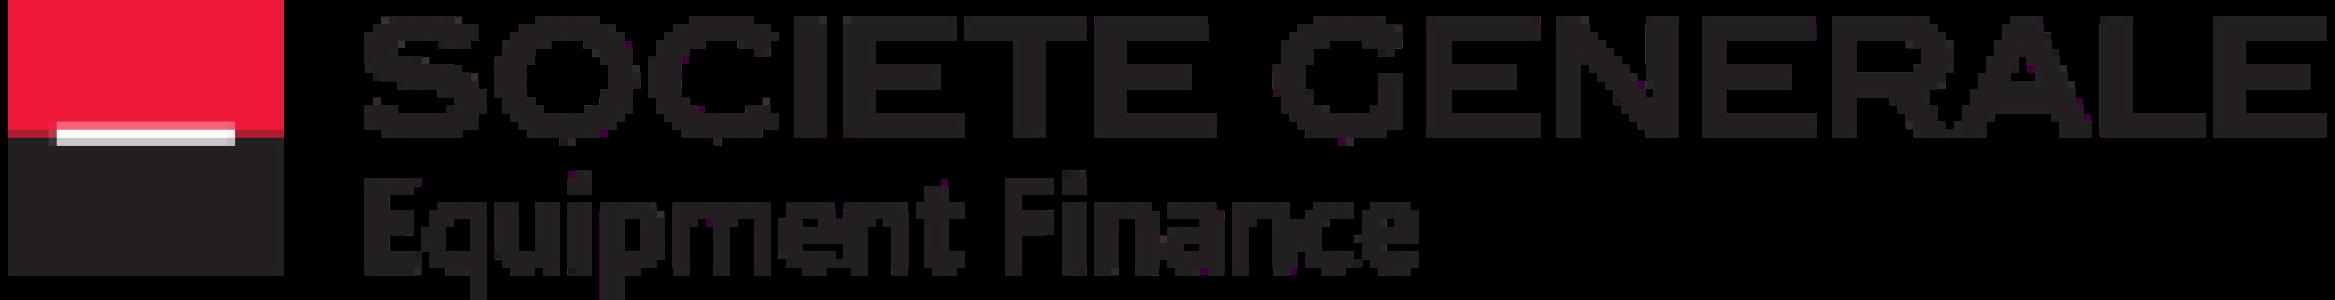 SG Finans